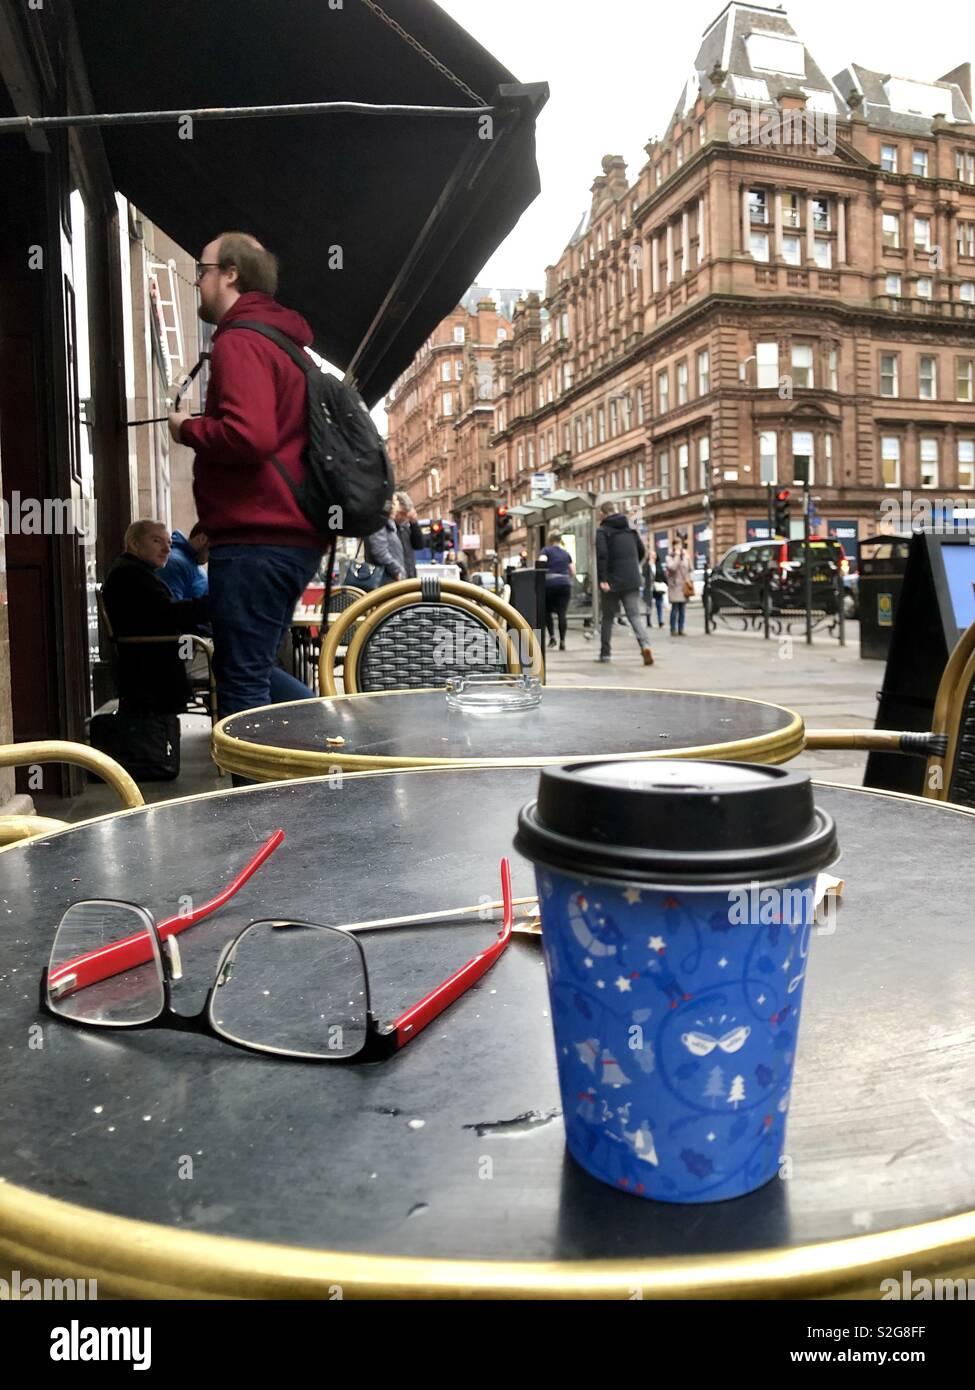 Street scene, Glasgow city centre. Scotland. United Kingdom. - Stock Image